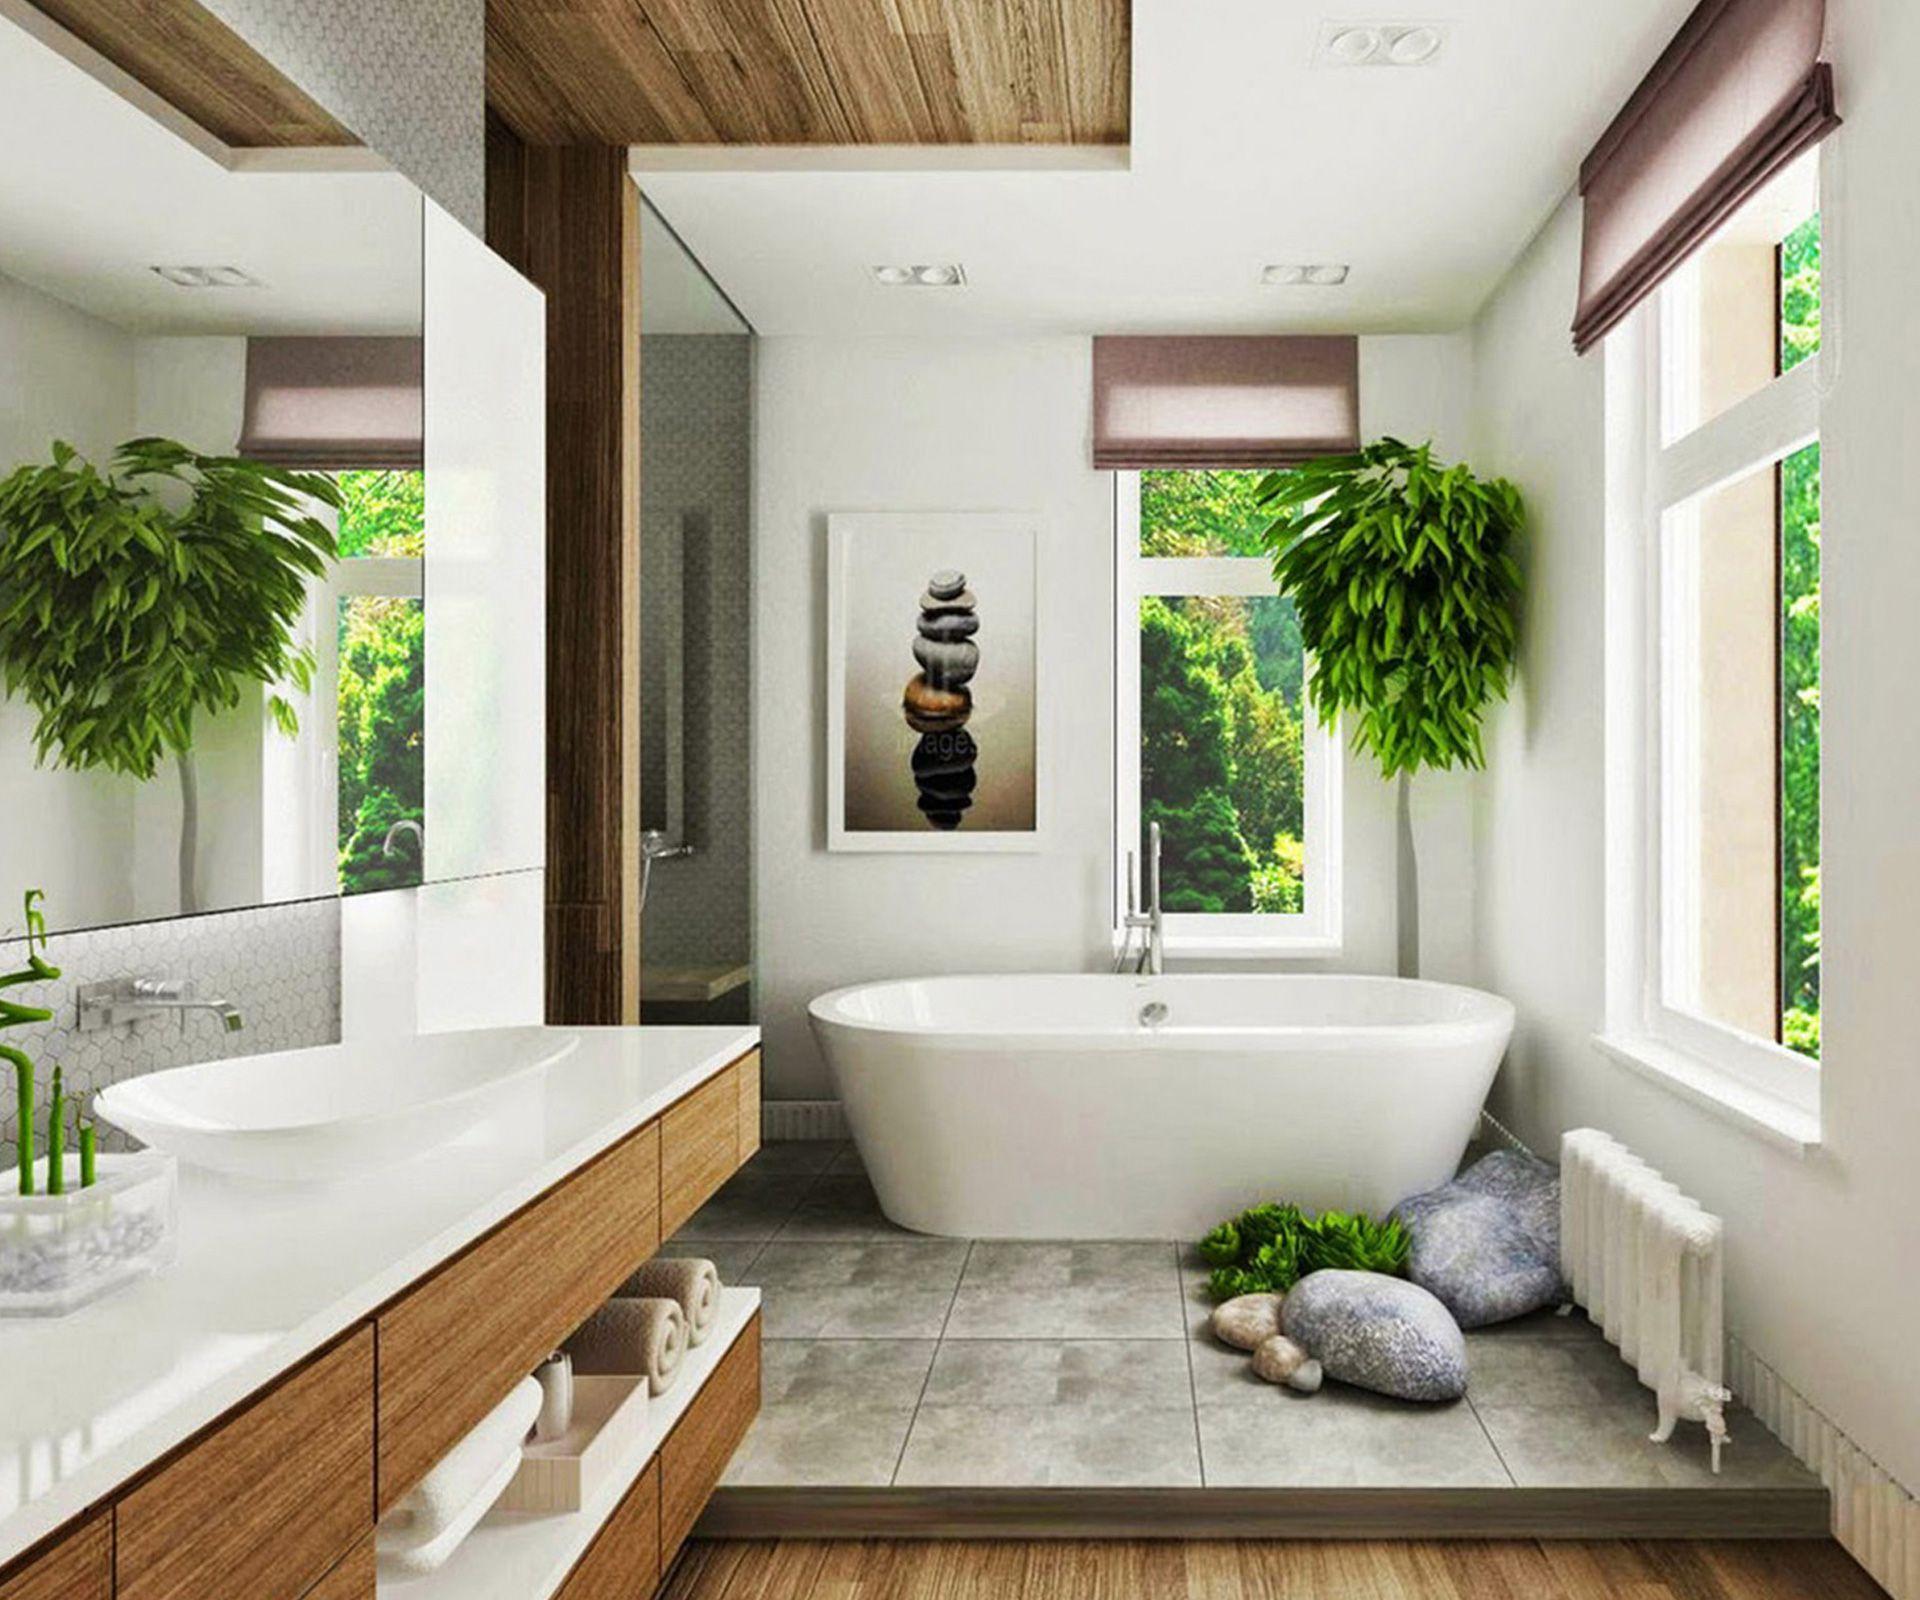 16 Ways To Utilize The Art of Feng Shui  Idée salle de bain, Idée